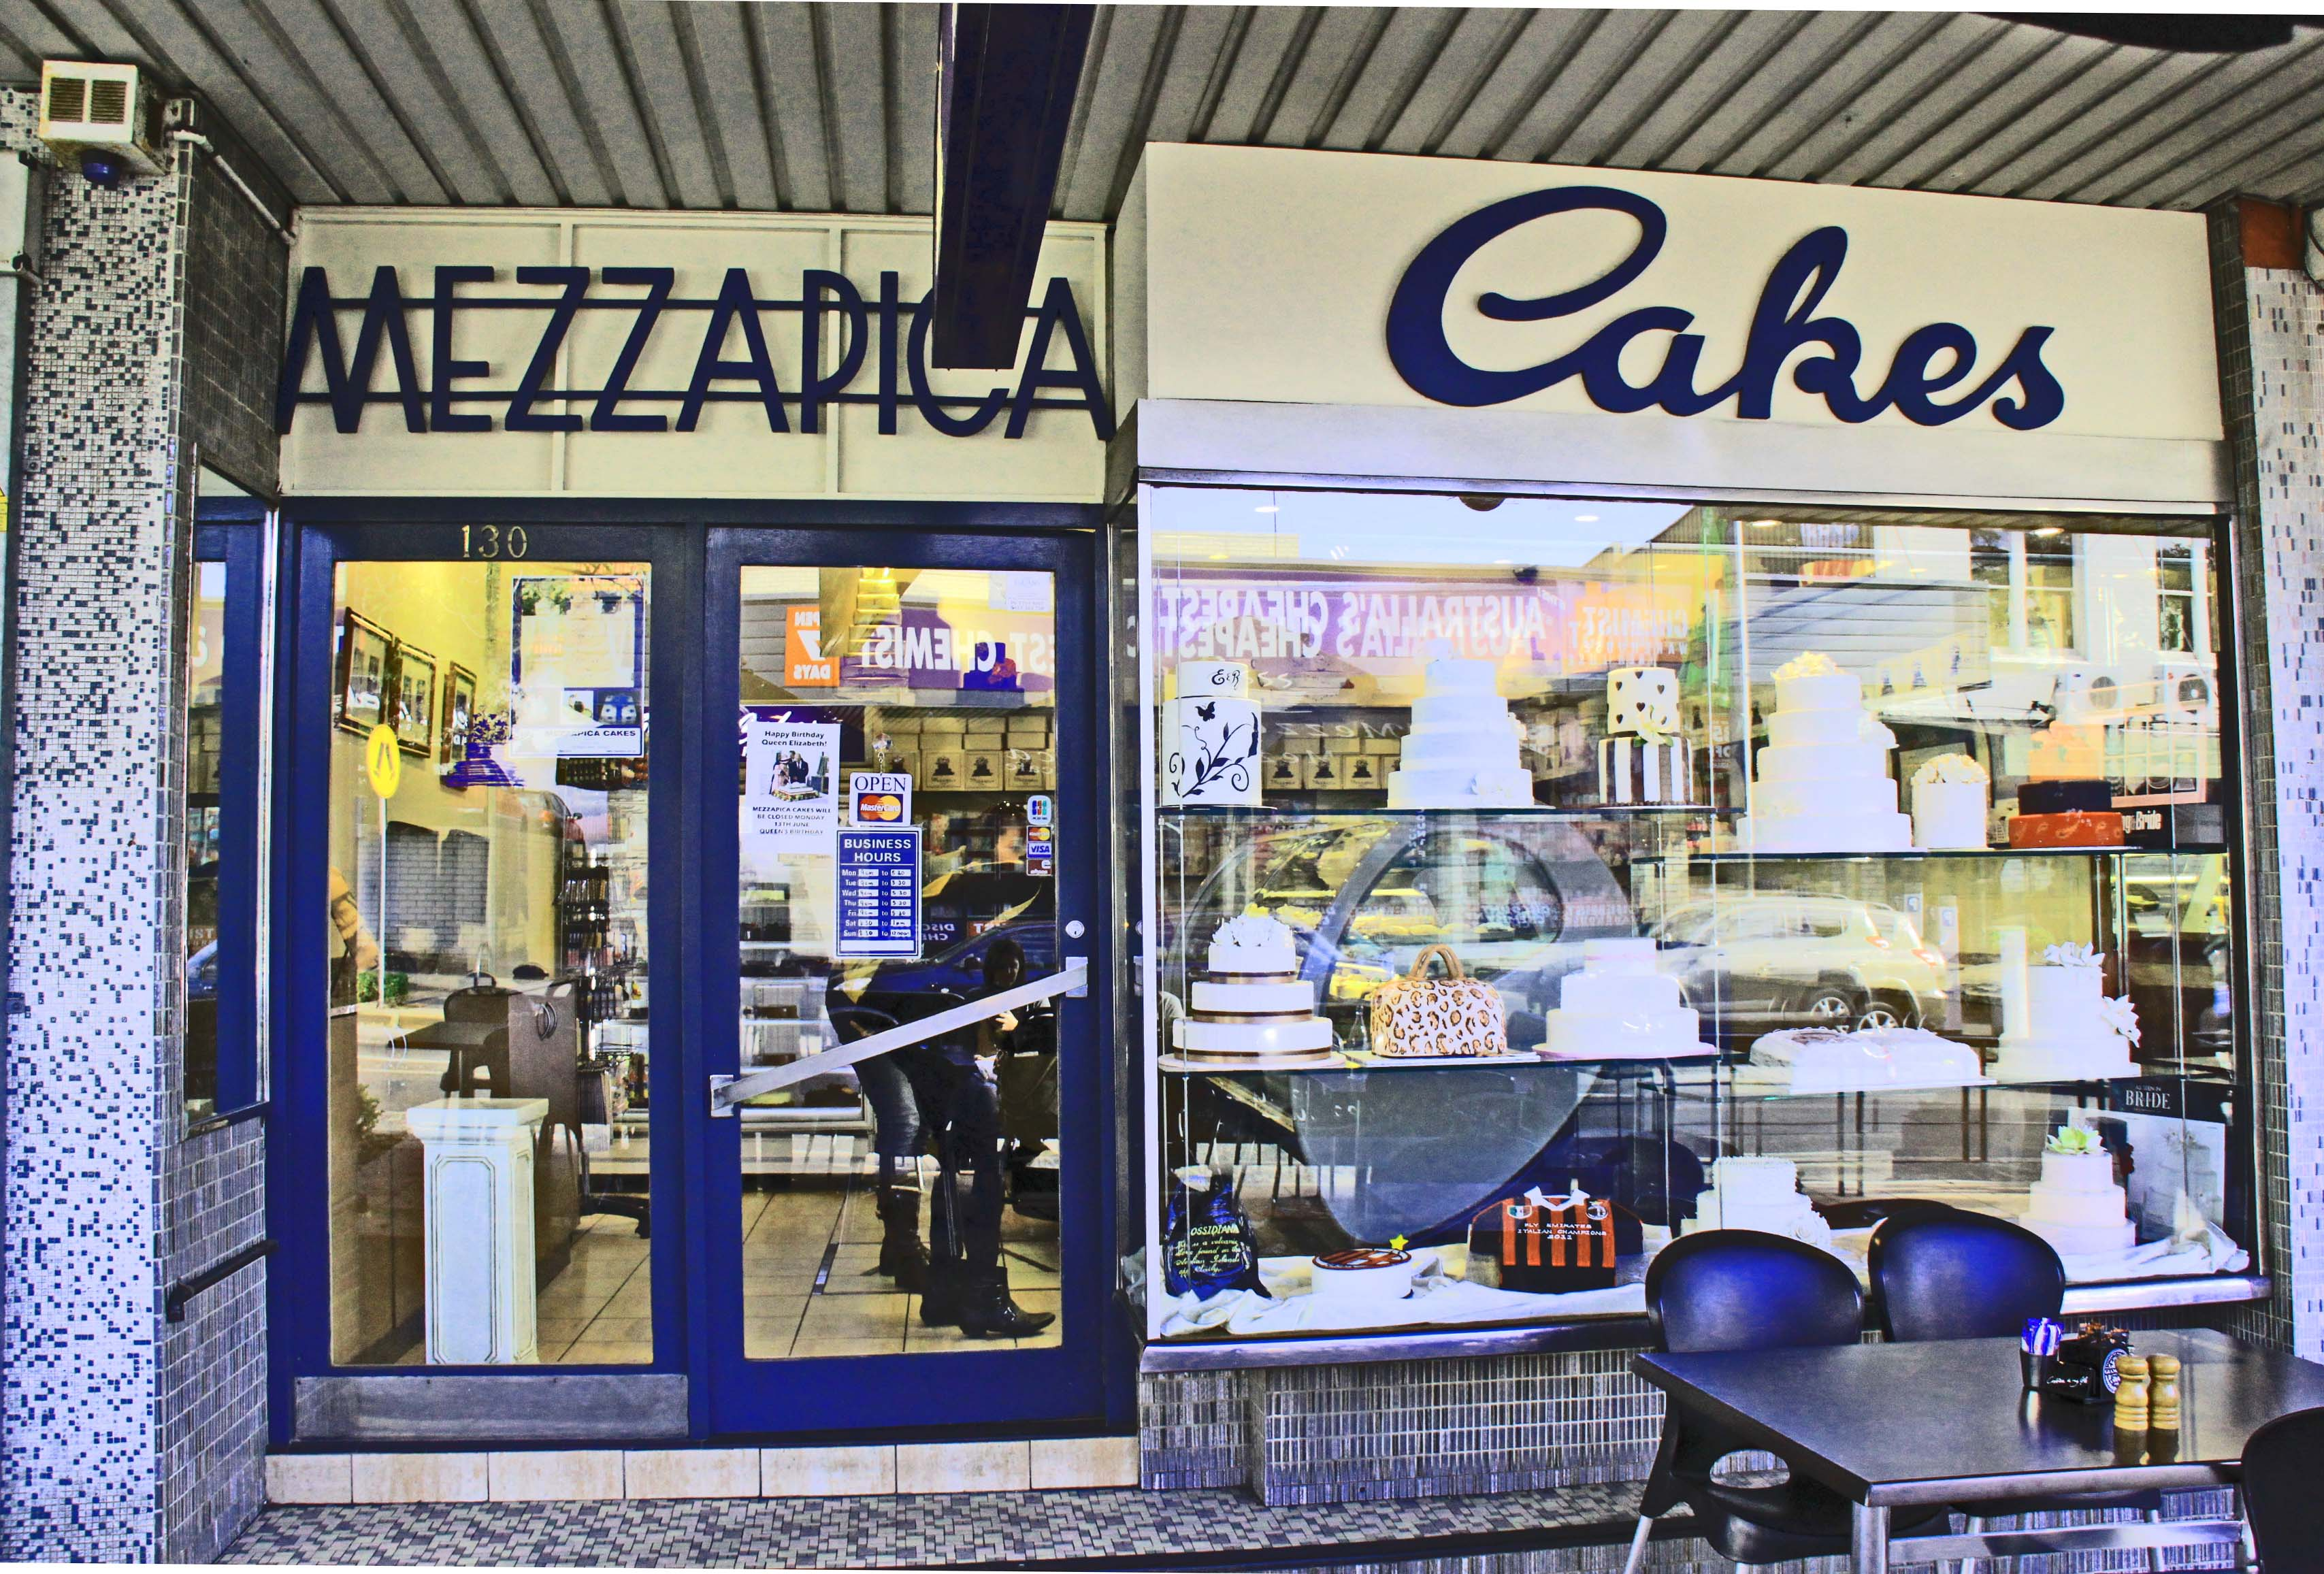 Mezzapica Cake Shop